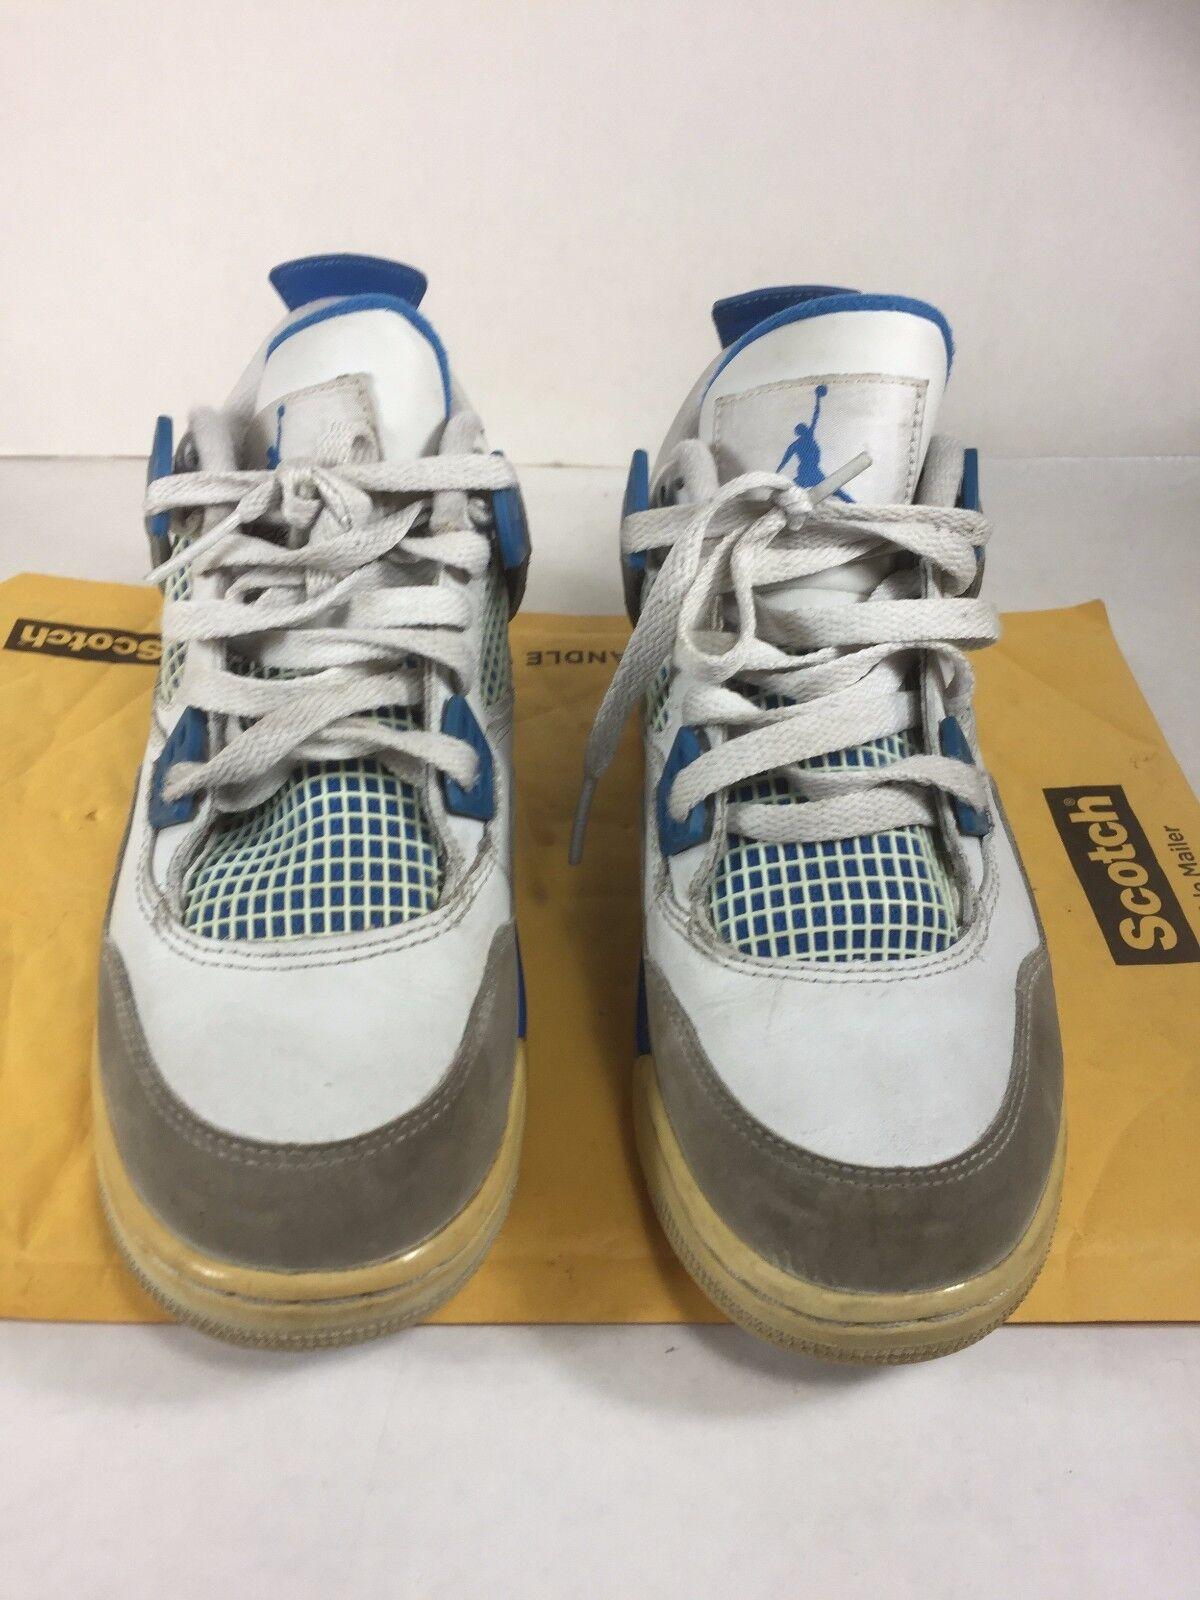 Air Jordan Retro IV 4 Military bluee White Neutral Grey Size 4 Youth GS